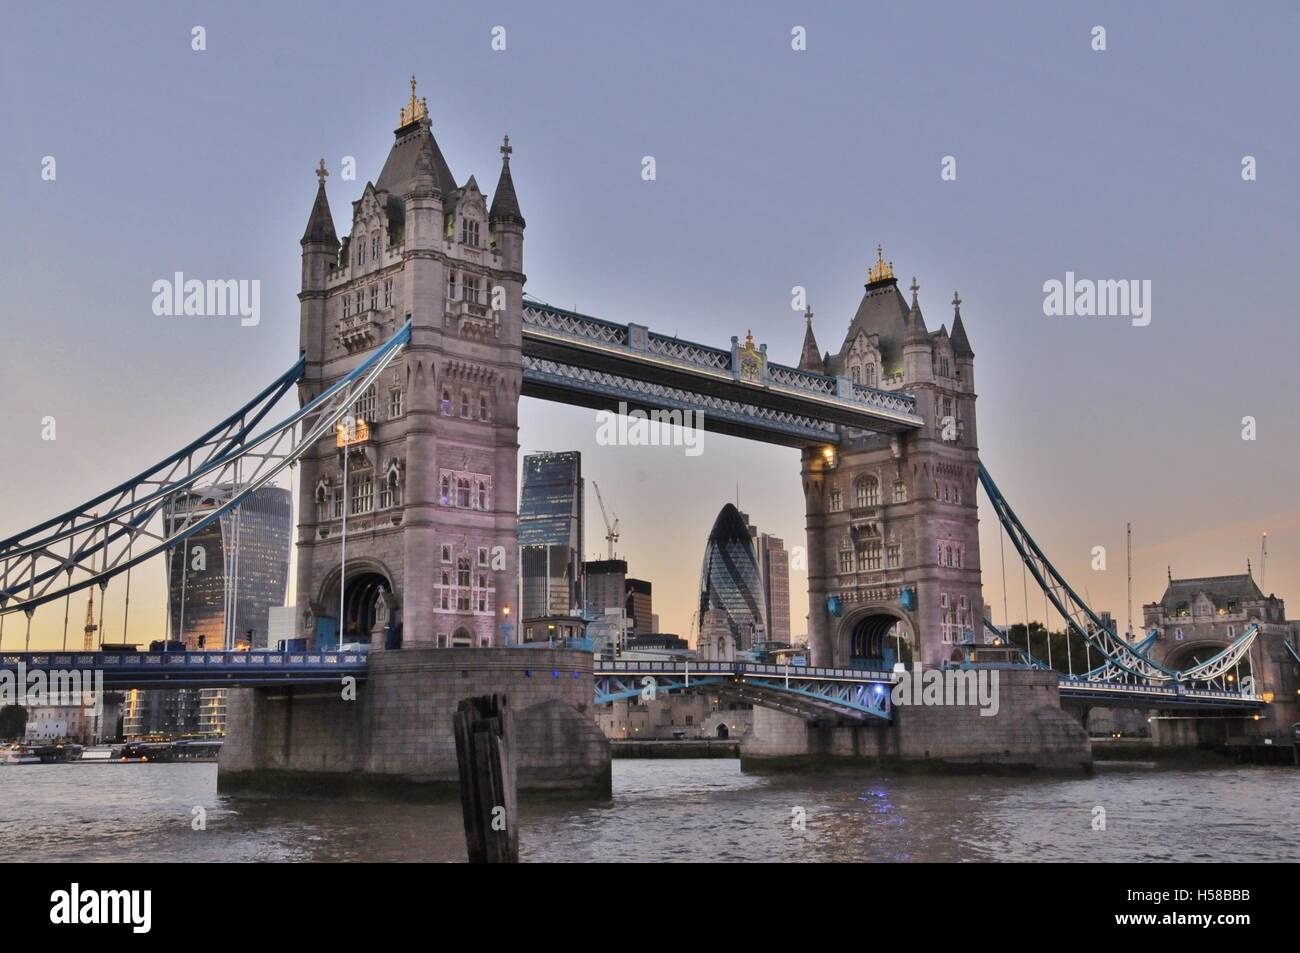 London's Tower Bridge. - Stock Image